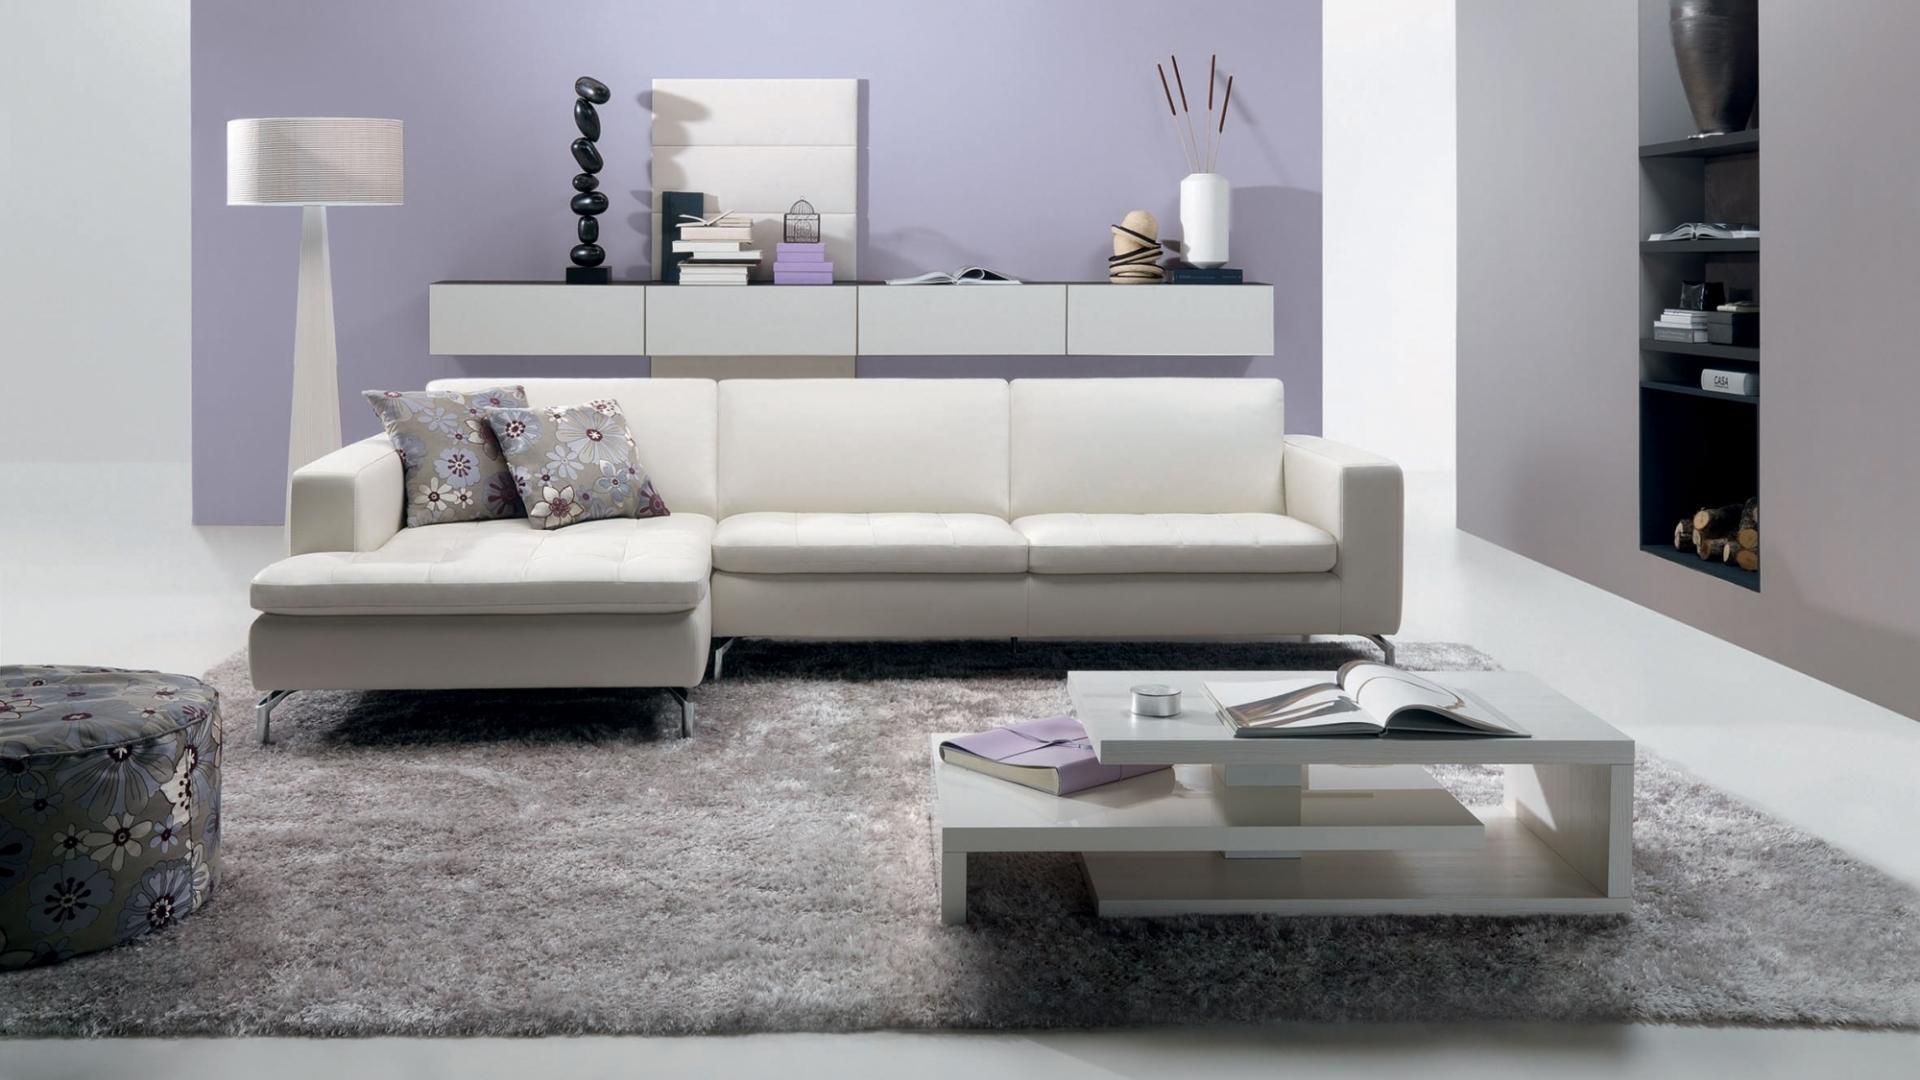 savoy leather sofa restoration hardware daftar harga bed minimalis murah 20 inspirations sofas | ideas